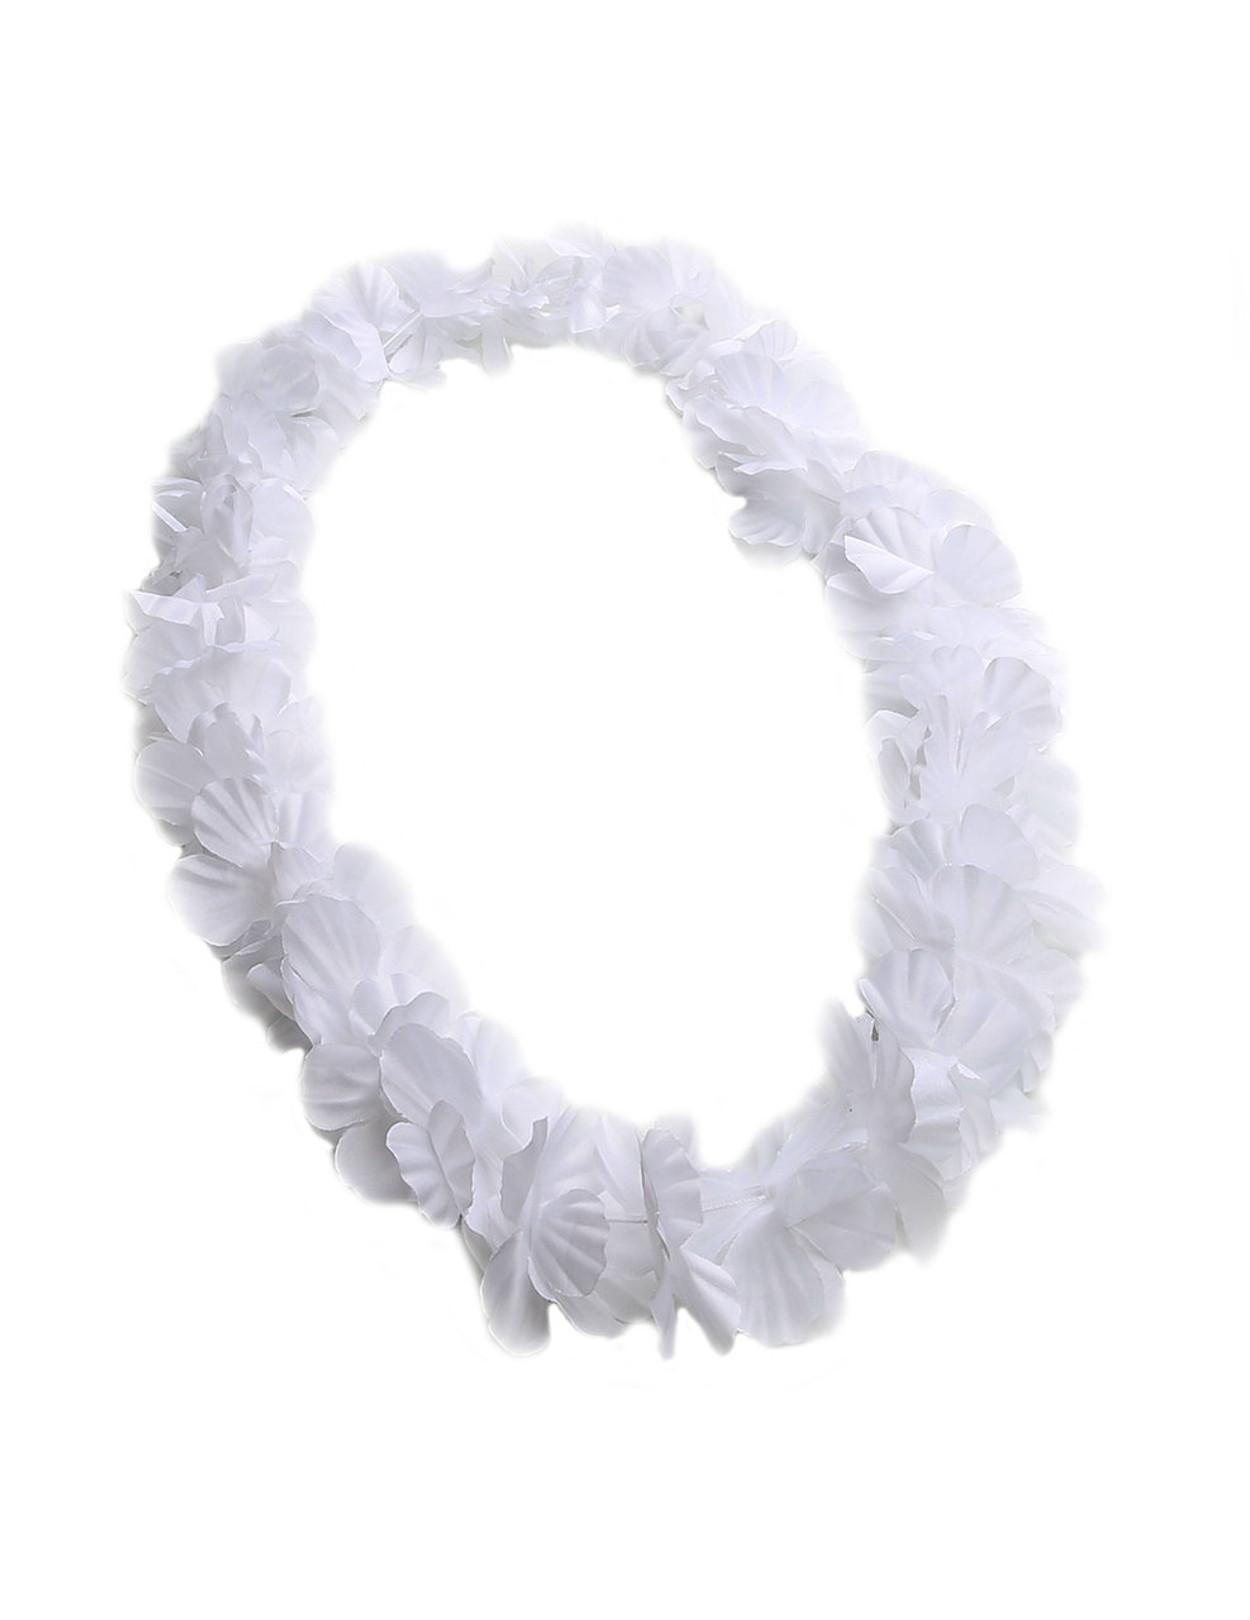 White party fun flower lei hawaiian wedding place white party fun flower lei durable long lasting silk unscented hypoallergenic color mightylinksfo